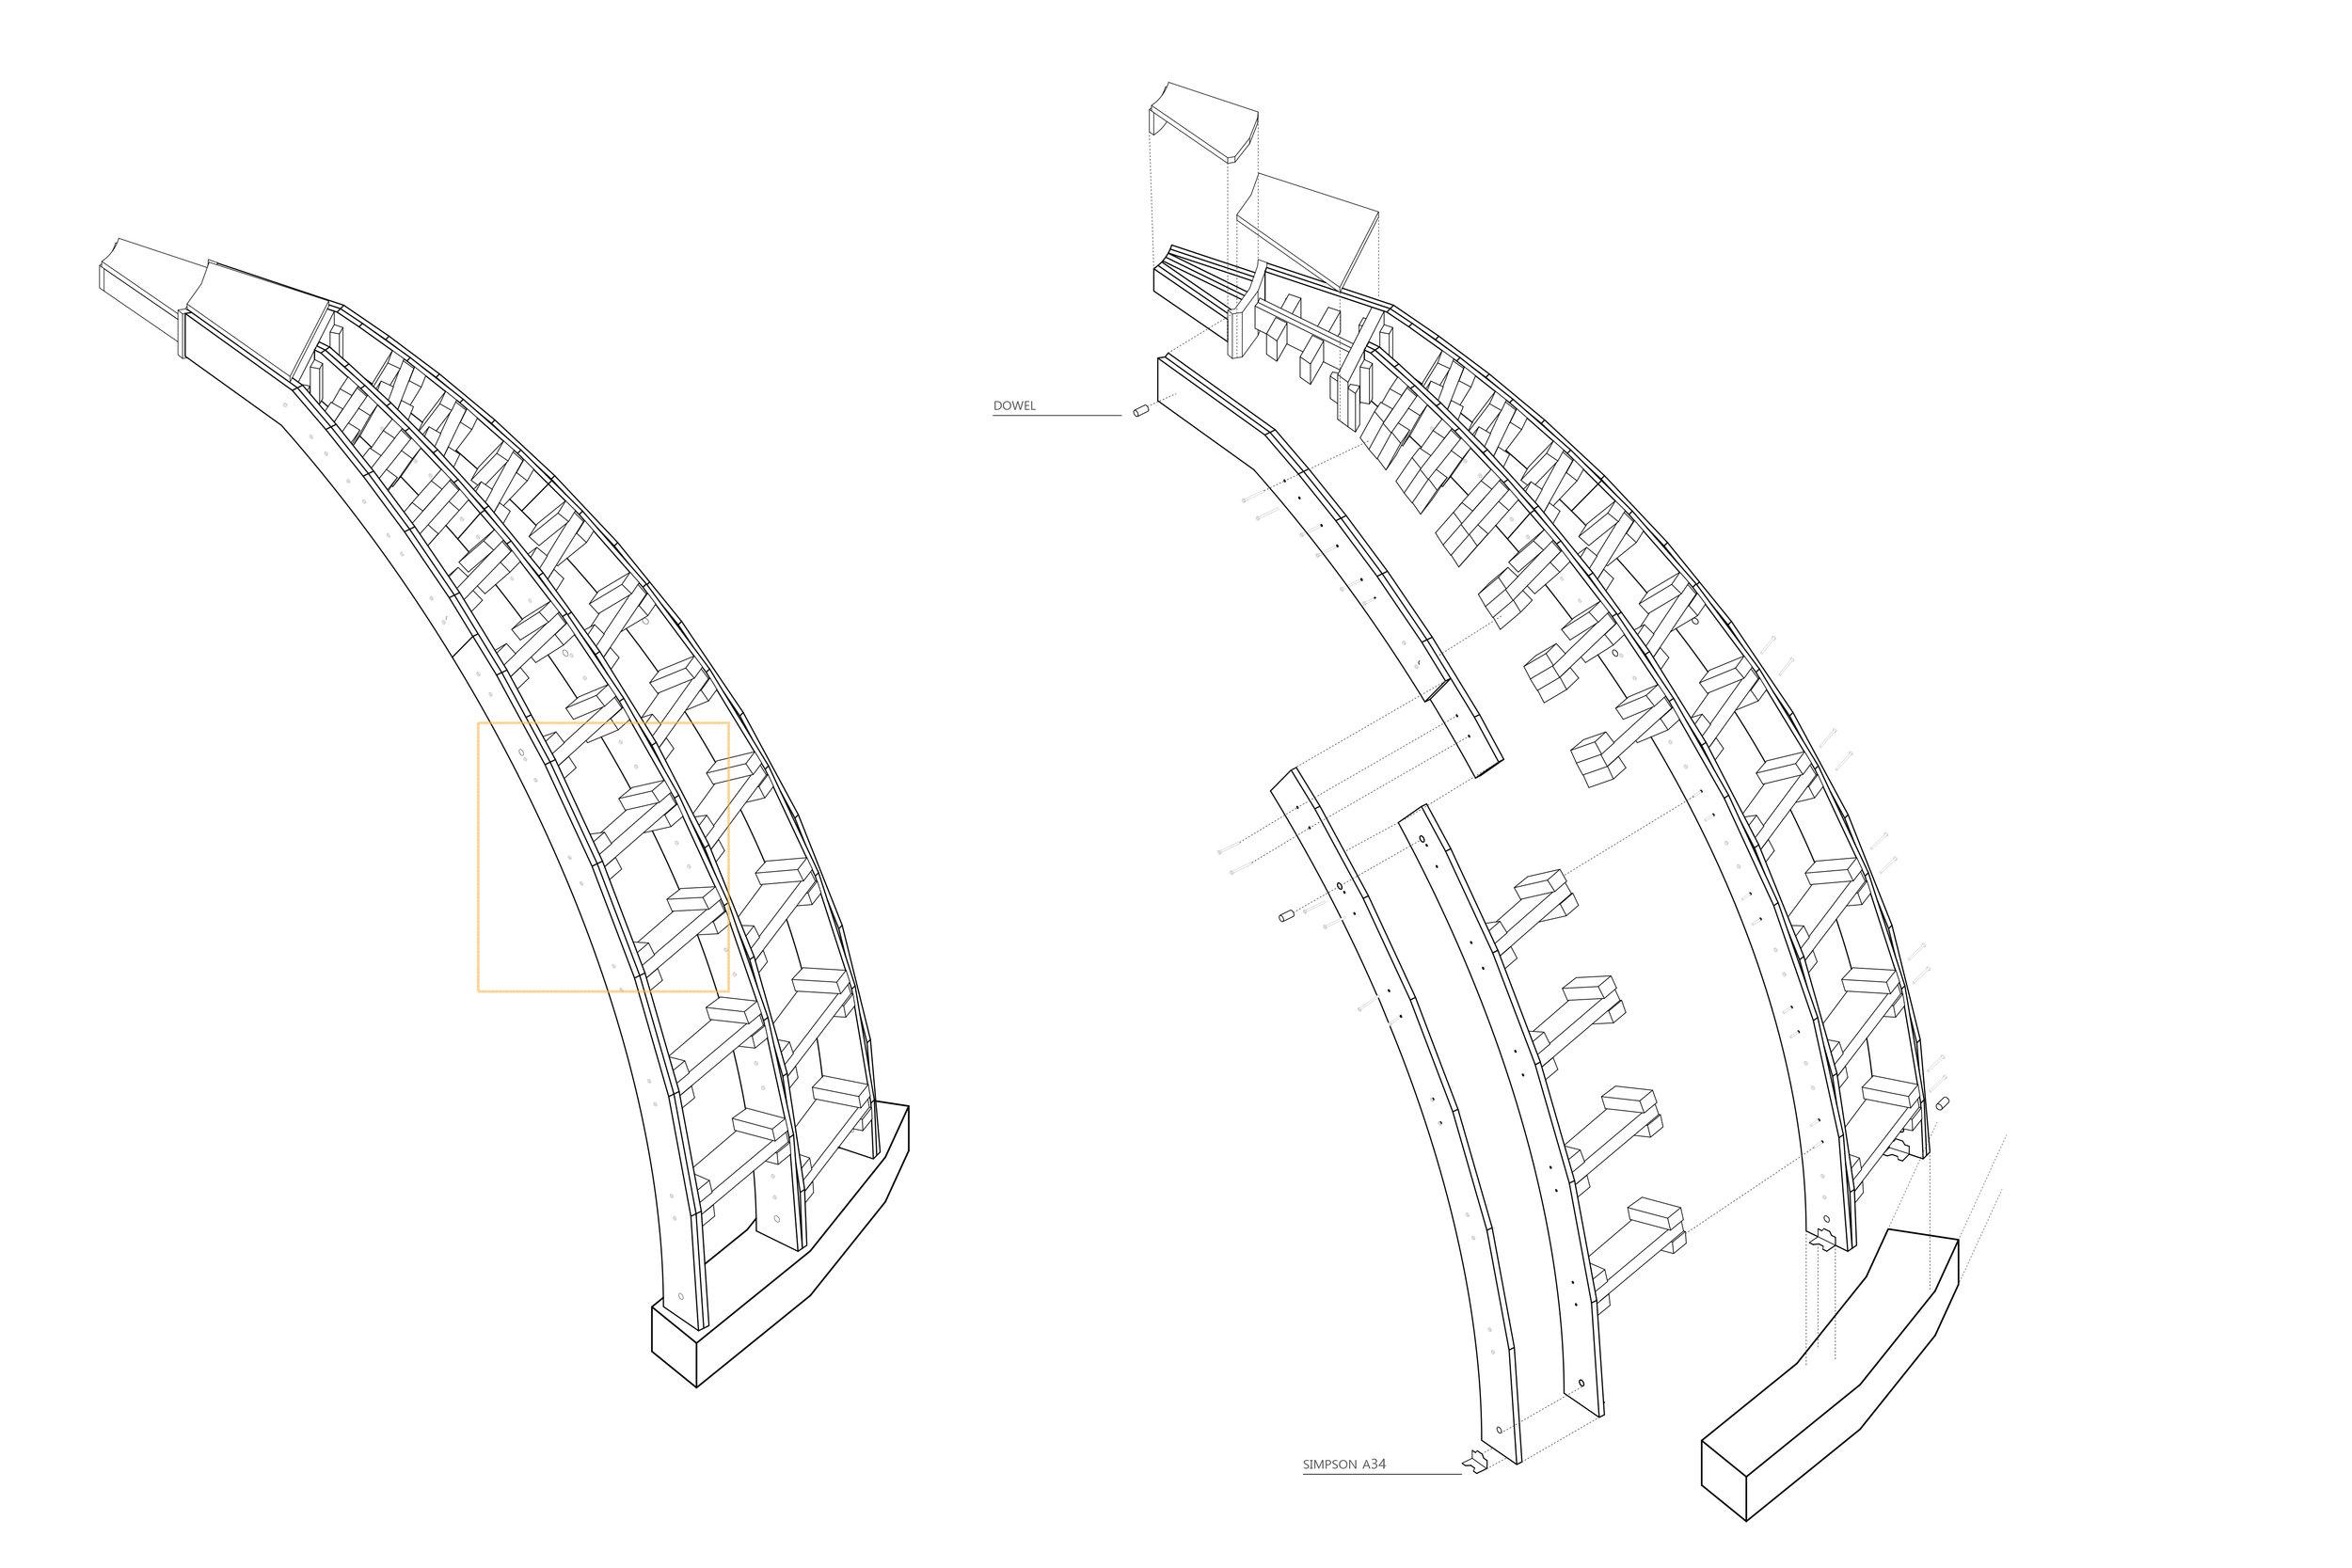 StructuralDrawing1.jpg